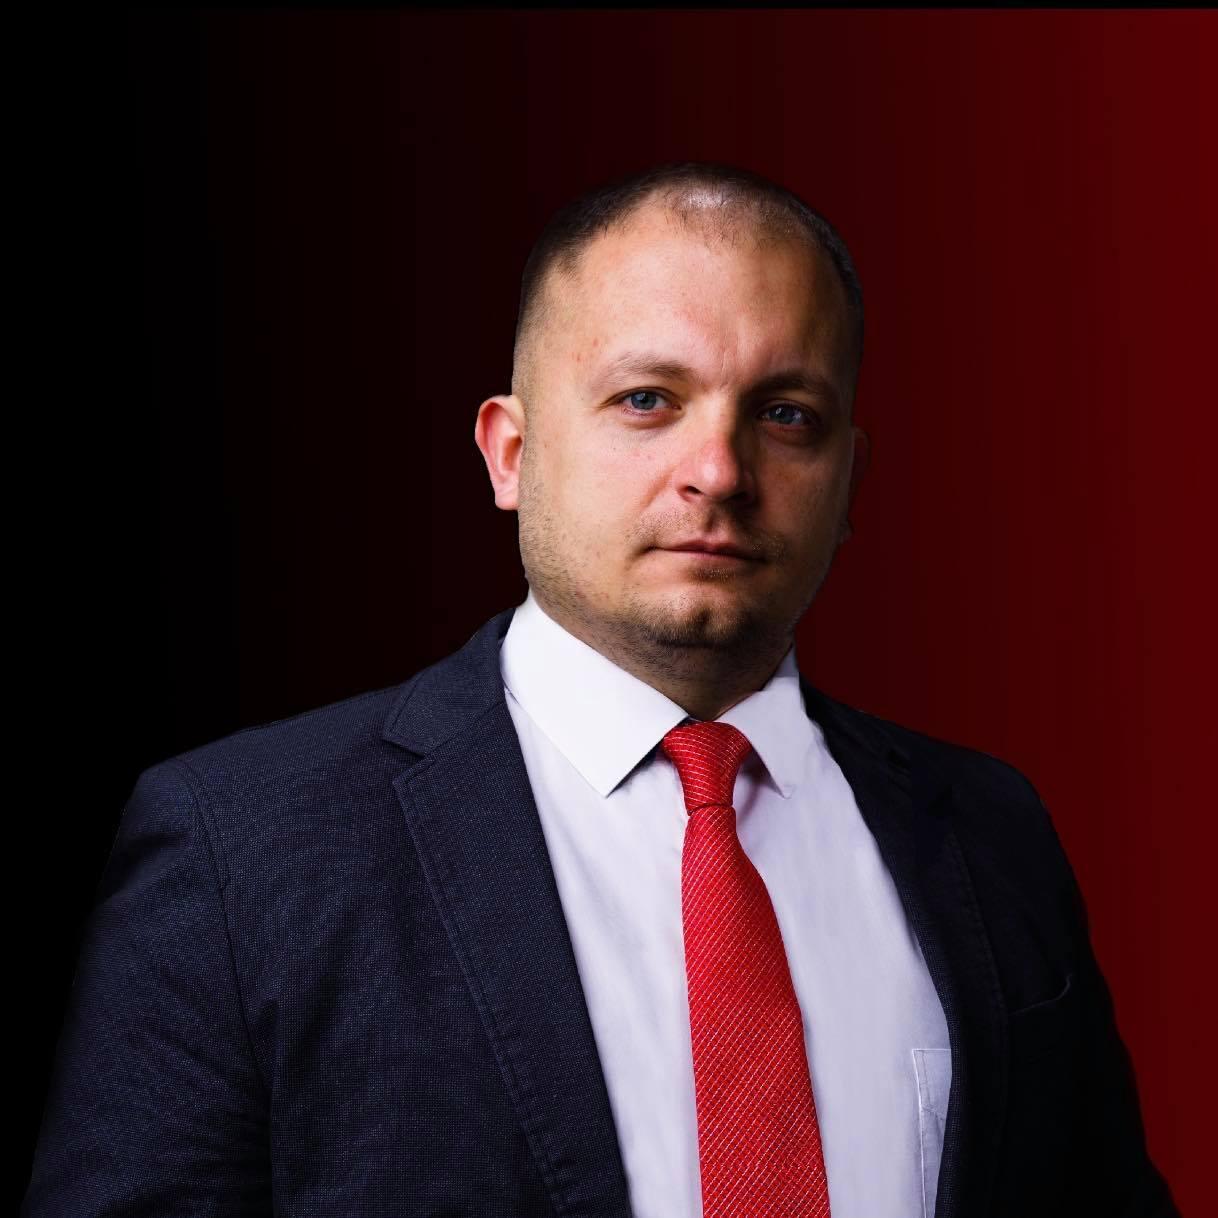 Артем Семеніхін - мер Конотопа